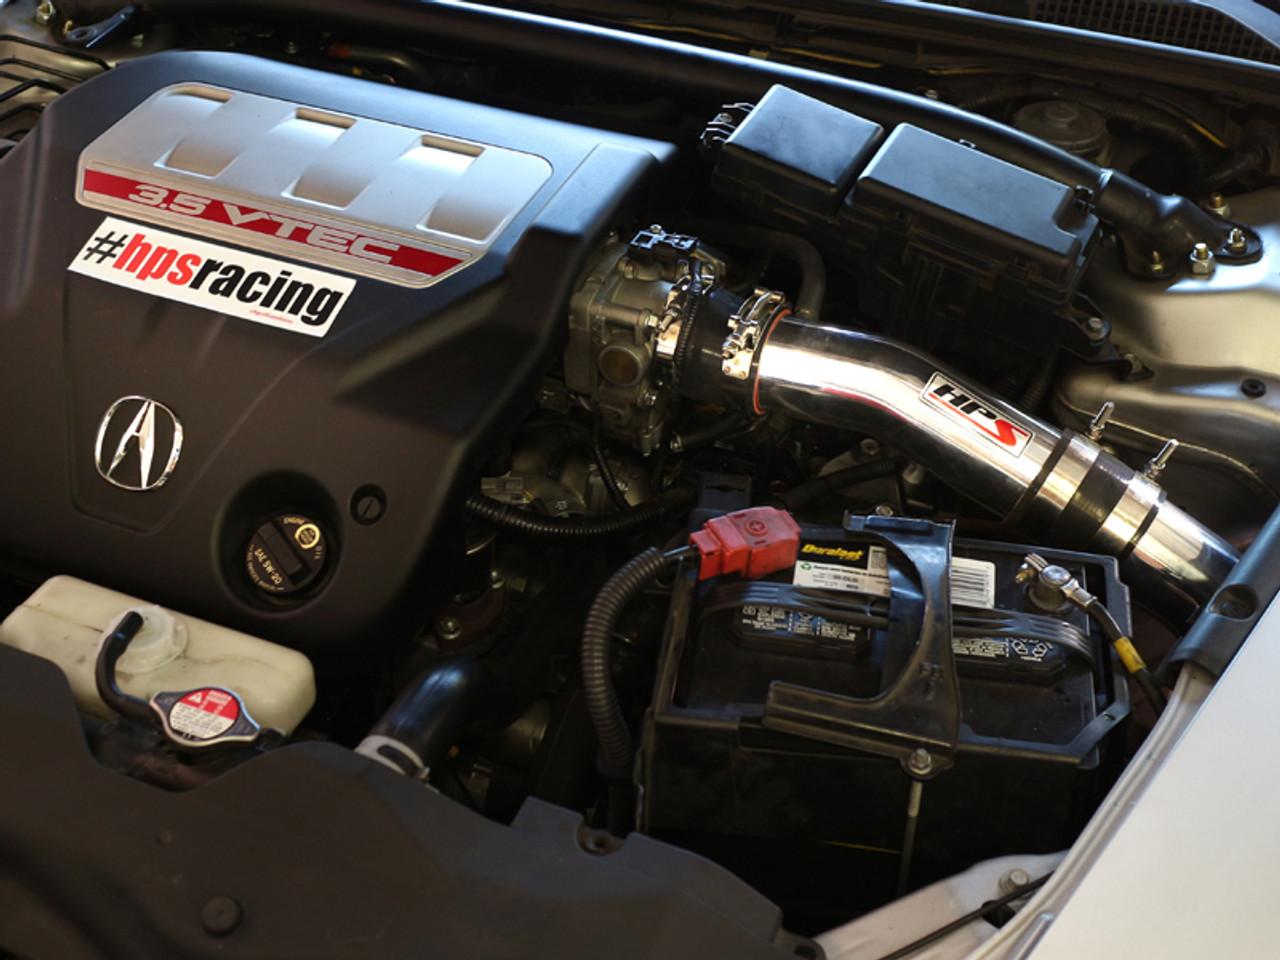 Hps Polish Cold Air Intake Converts To Shortram For 07 08 Acura Tl Type S 3 5l V6 Enjuku Racing Parts Llc